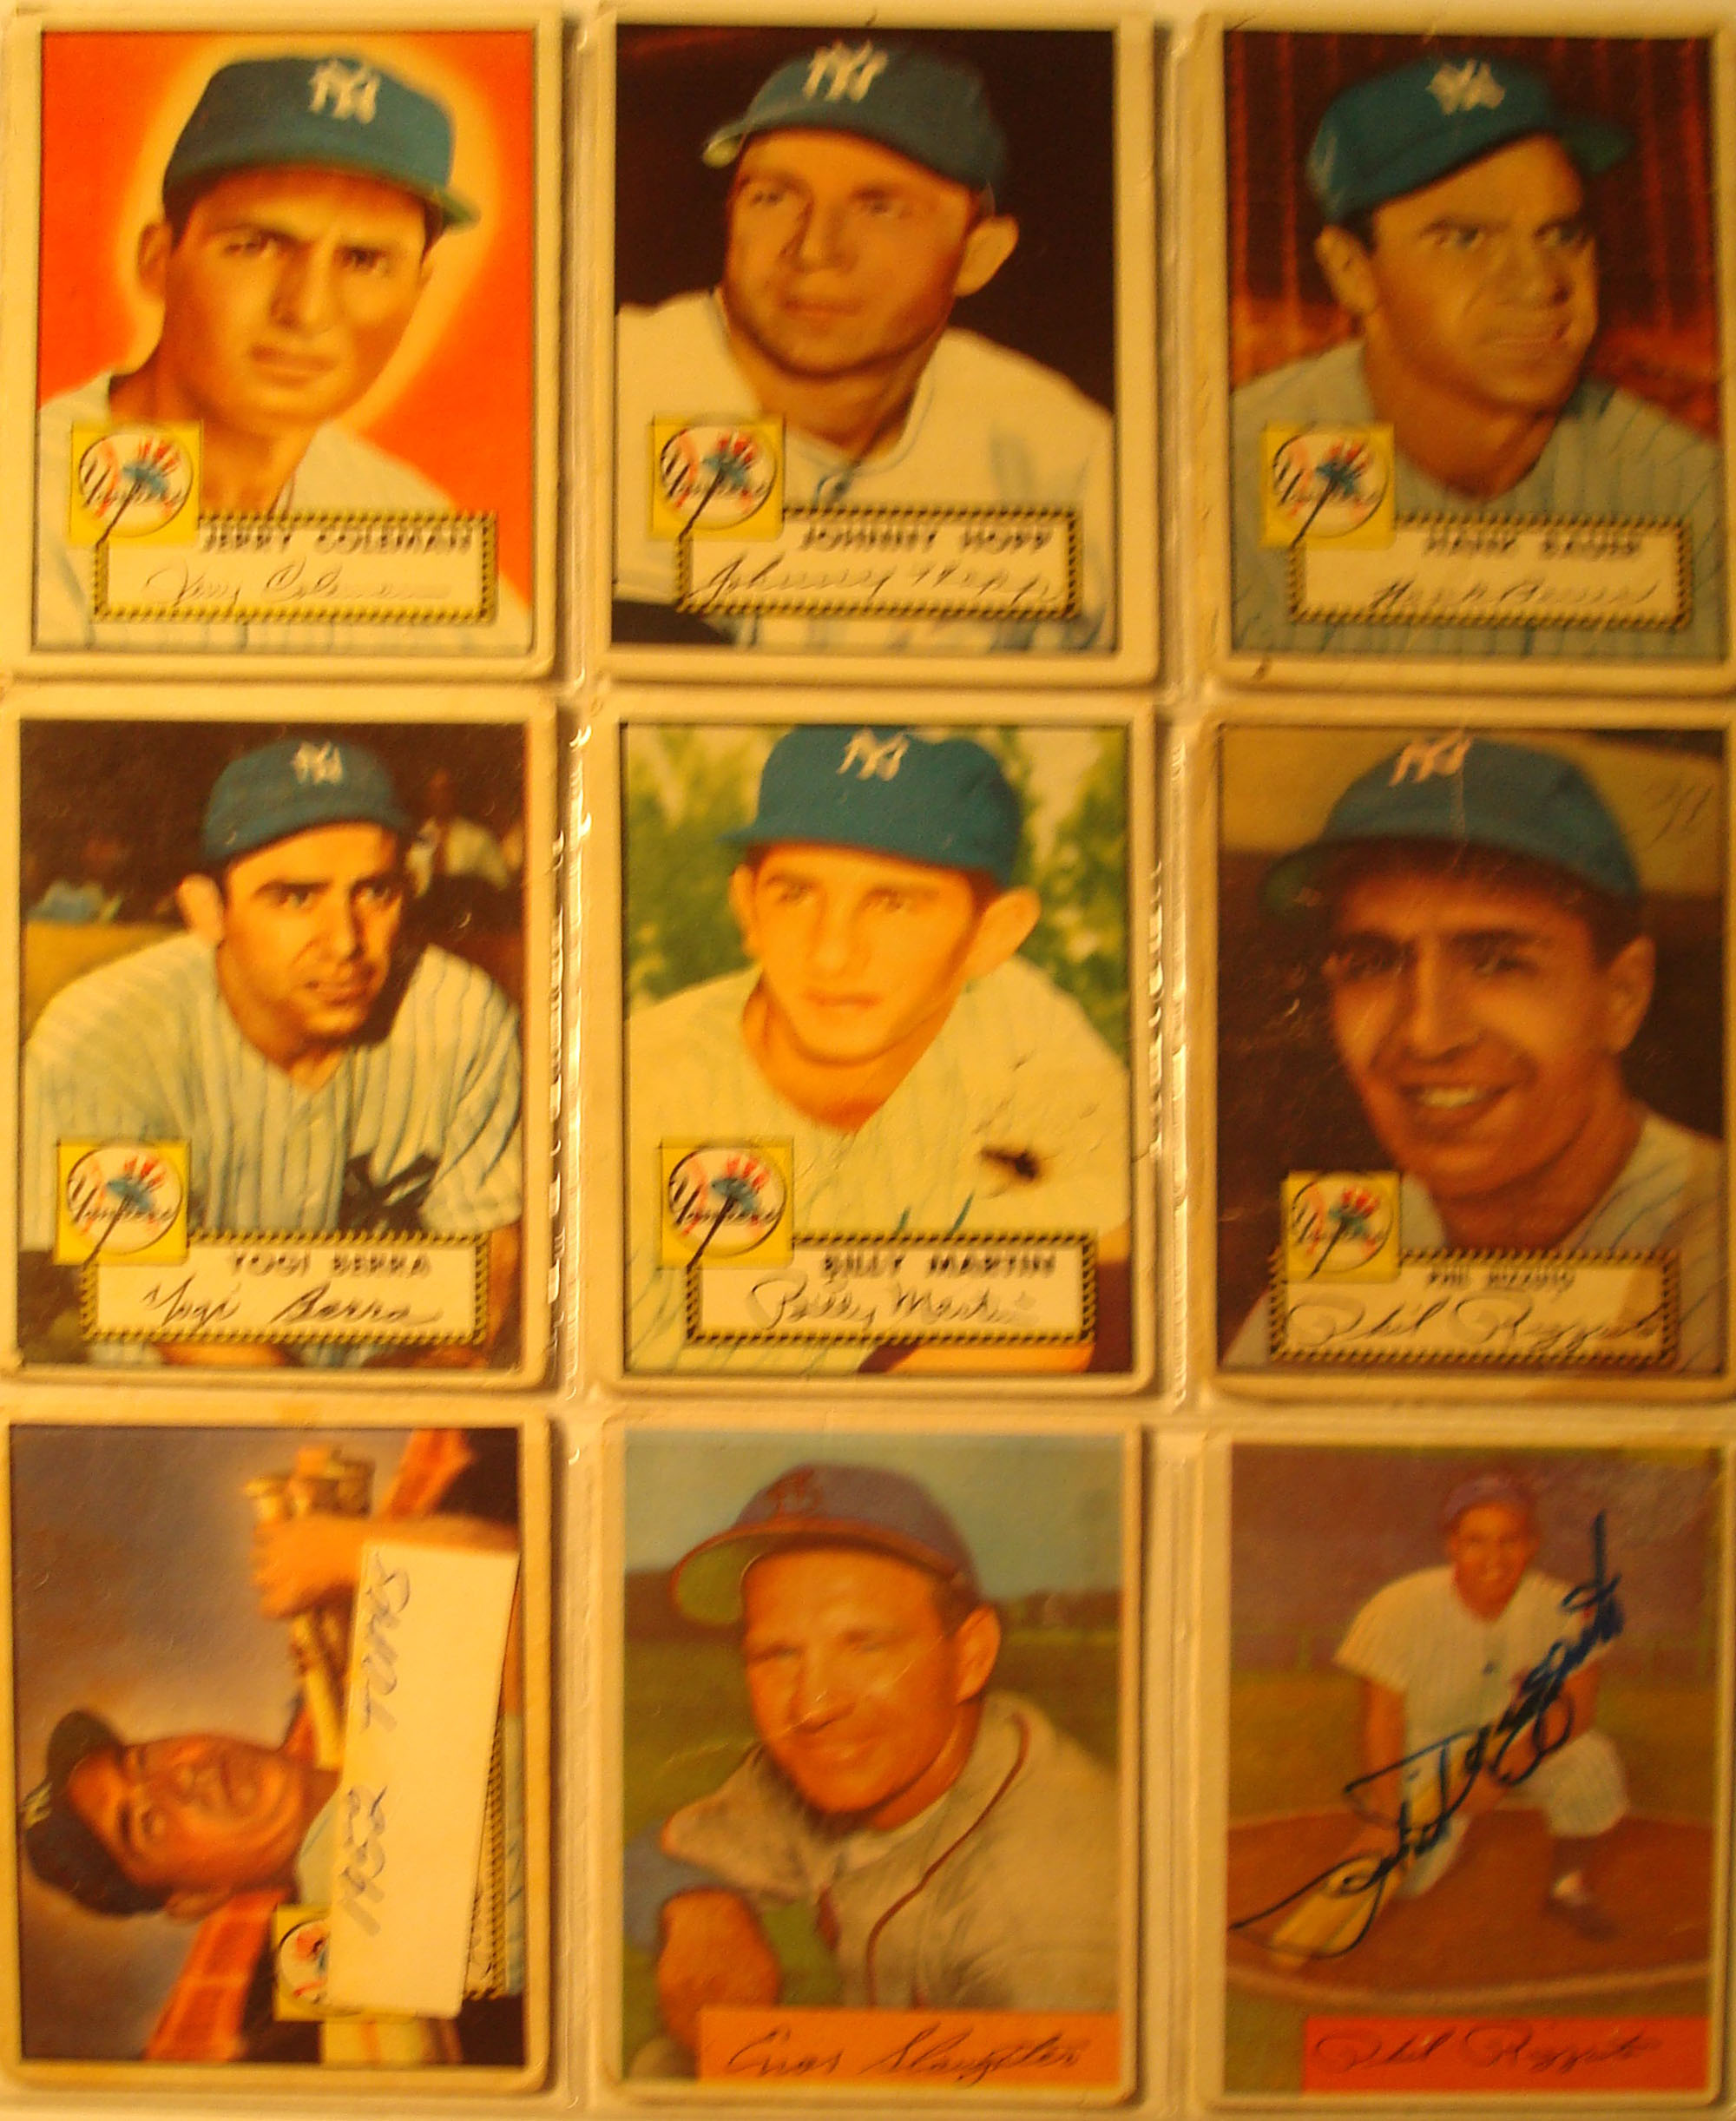 Bone Daddys New York Yankees Baseball Card Collection